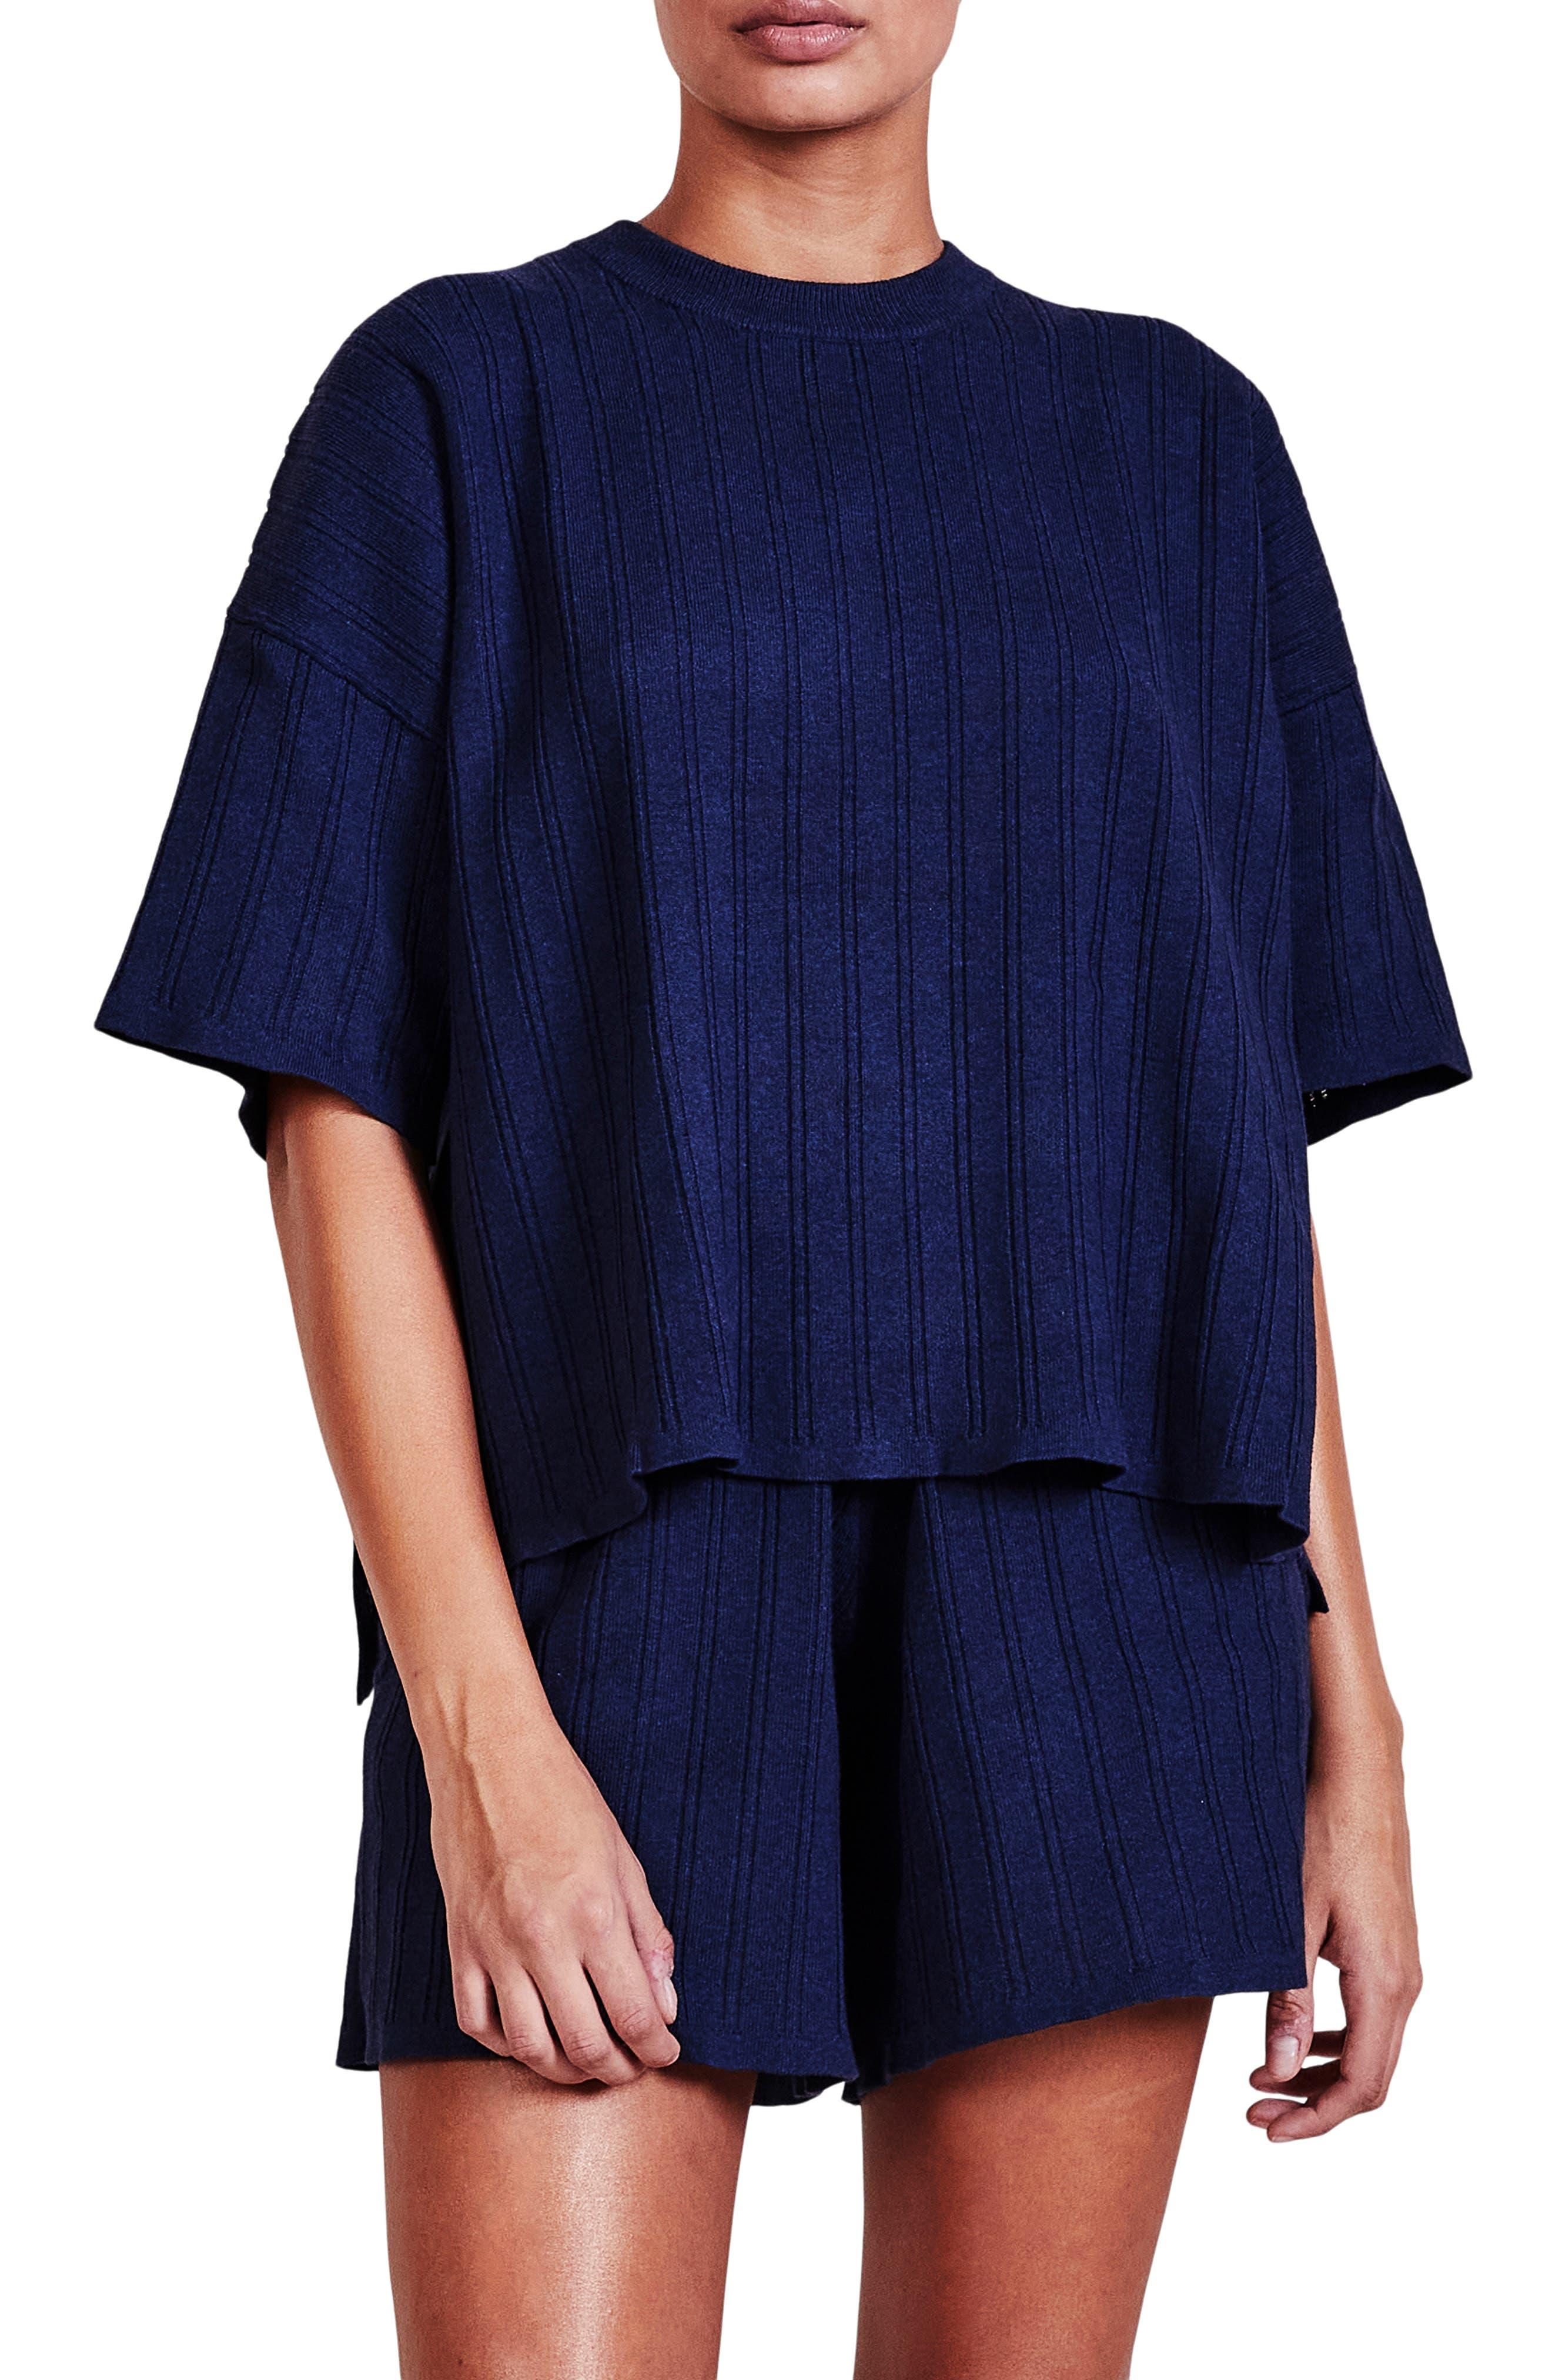 Oversize Short Sleeve Sweater